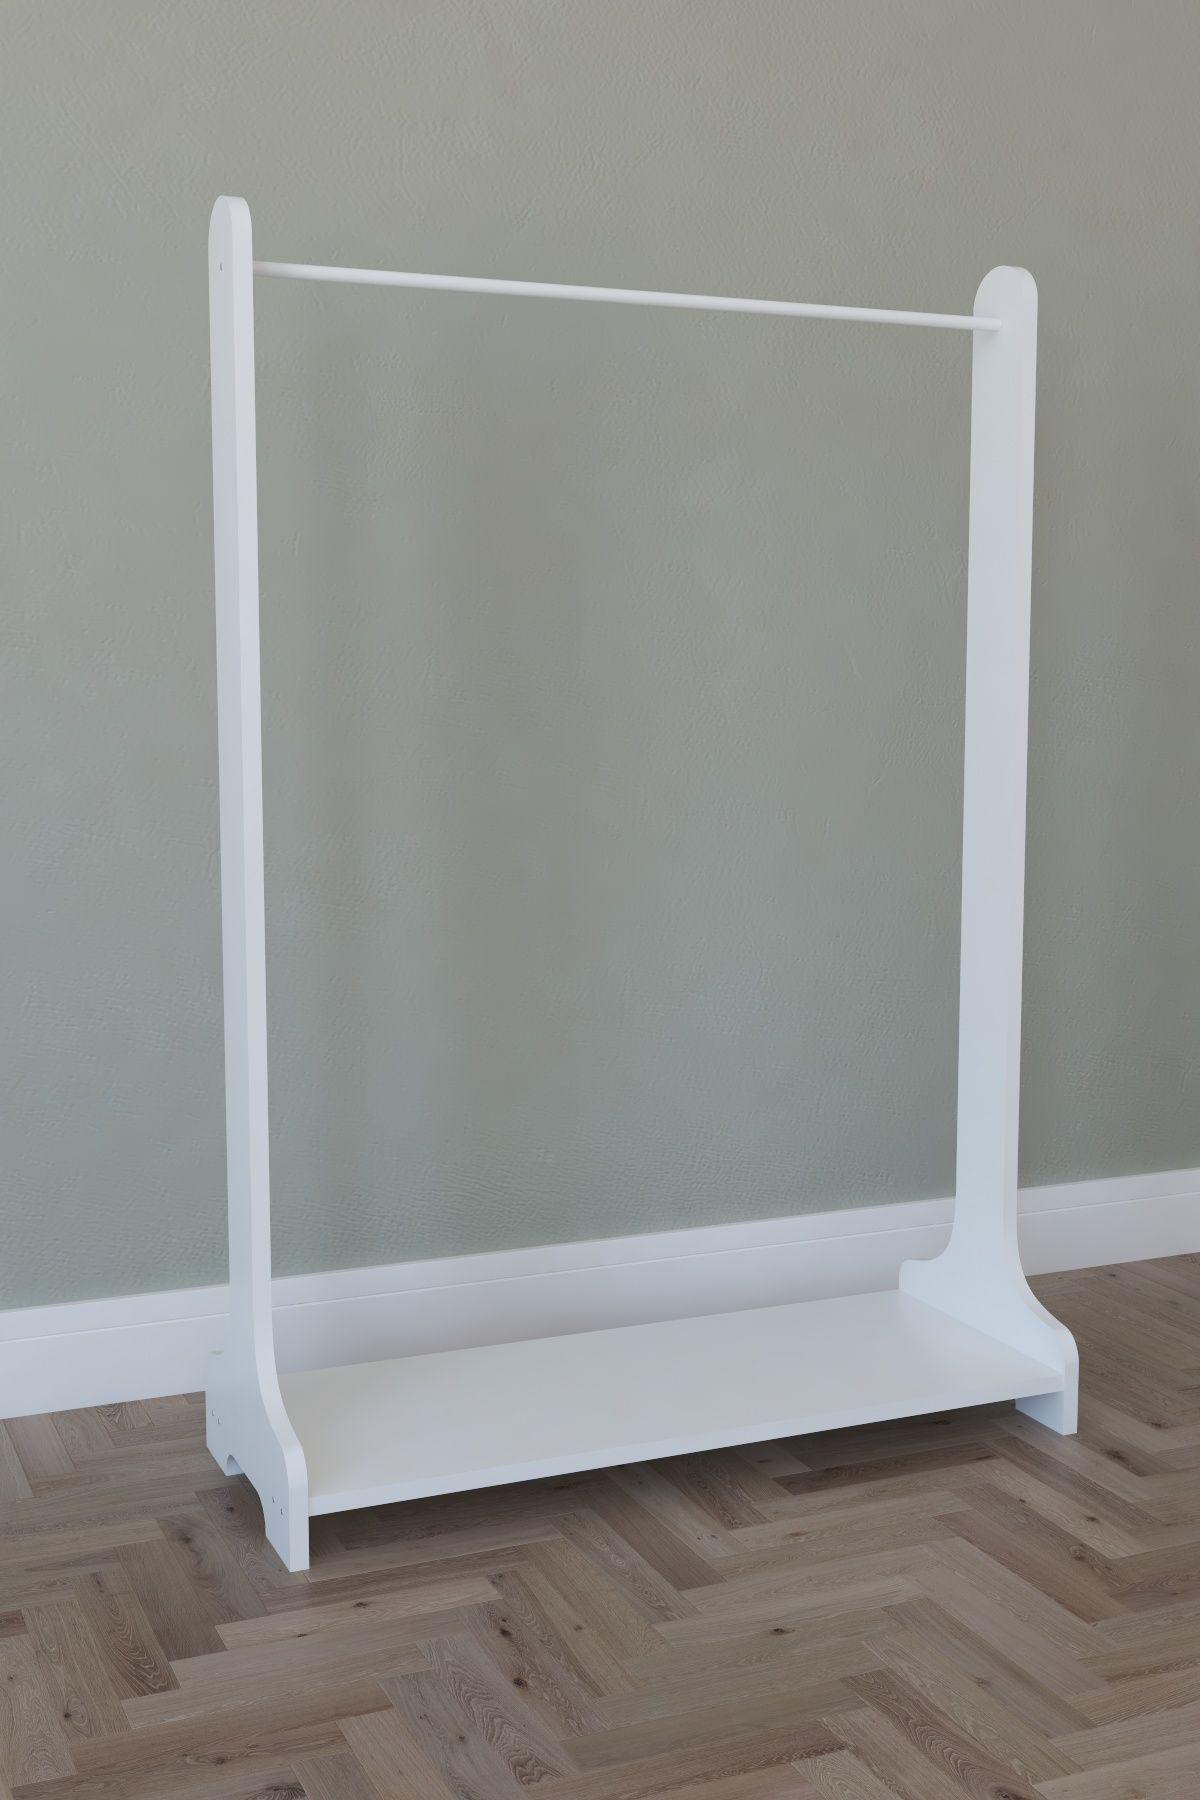 Suport de umeraseStyl Homs85 x 127 x 34 cm, Alb